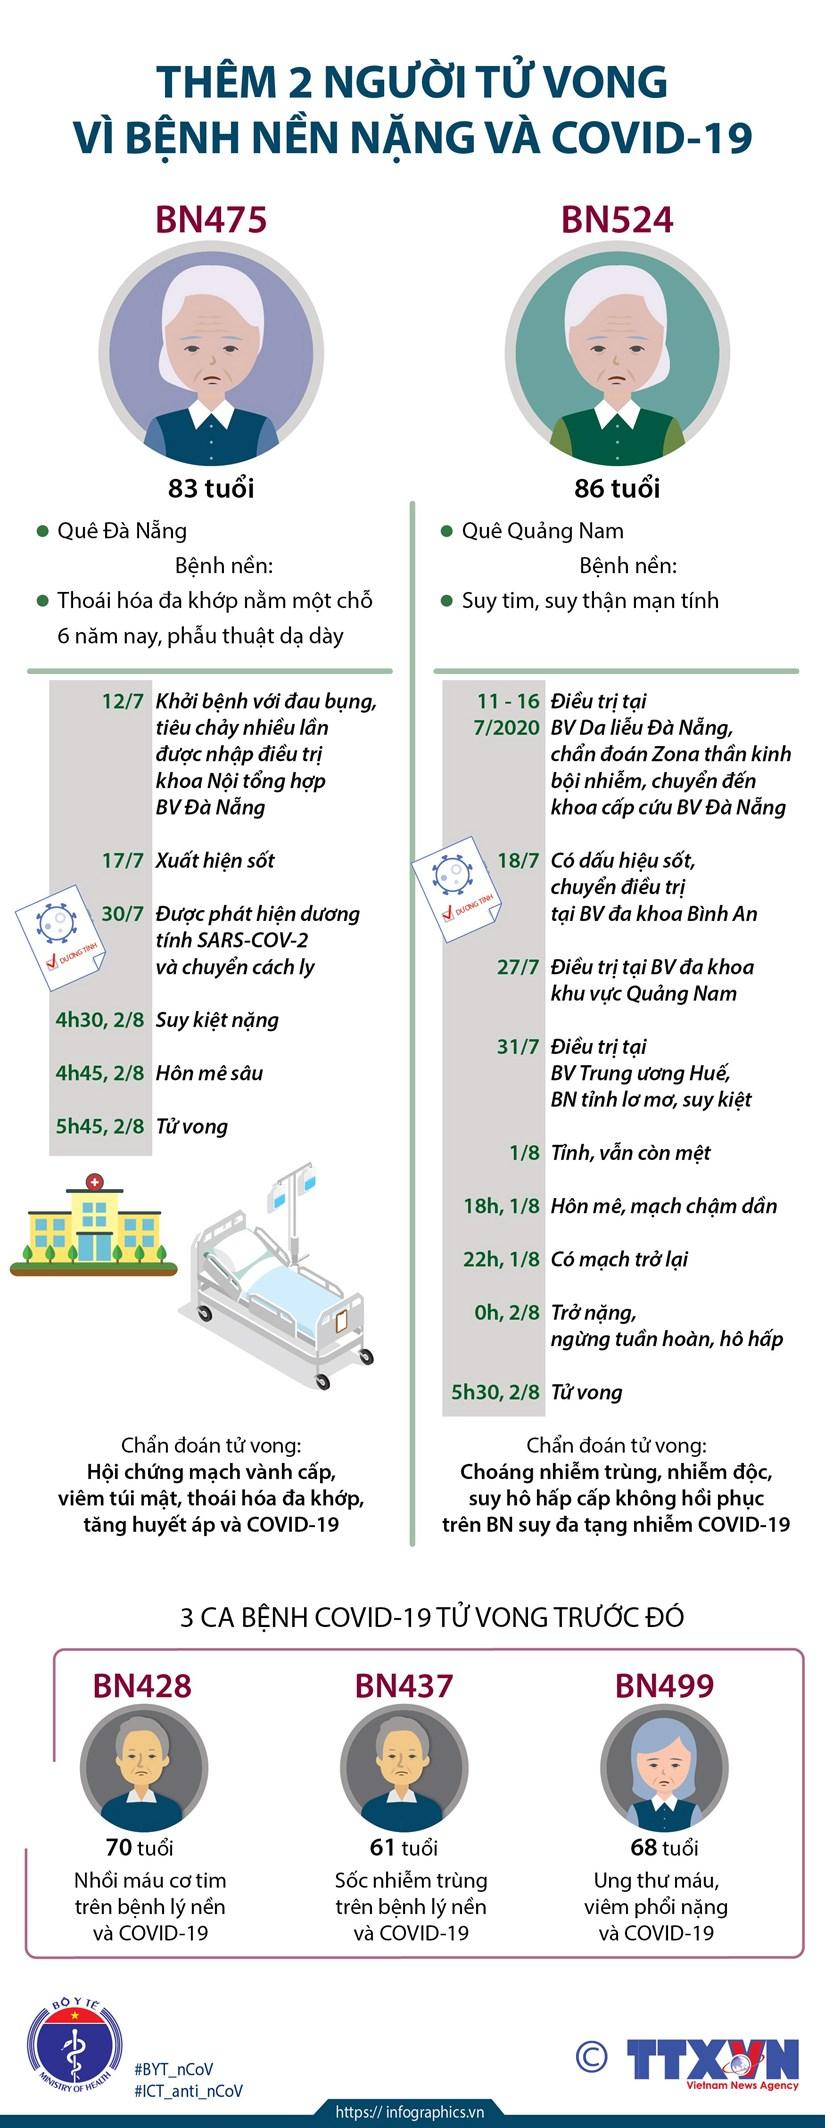 [Infographics] Them 2 nguoi tu vong vi benh nen nang va COVID-19 hinh anh 1